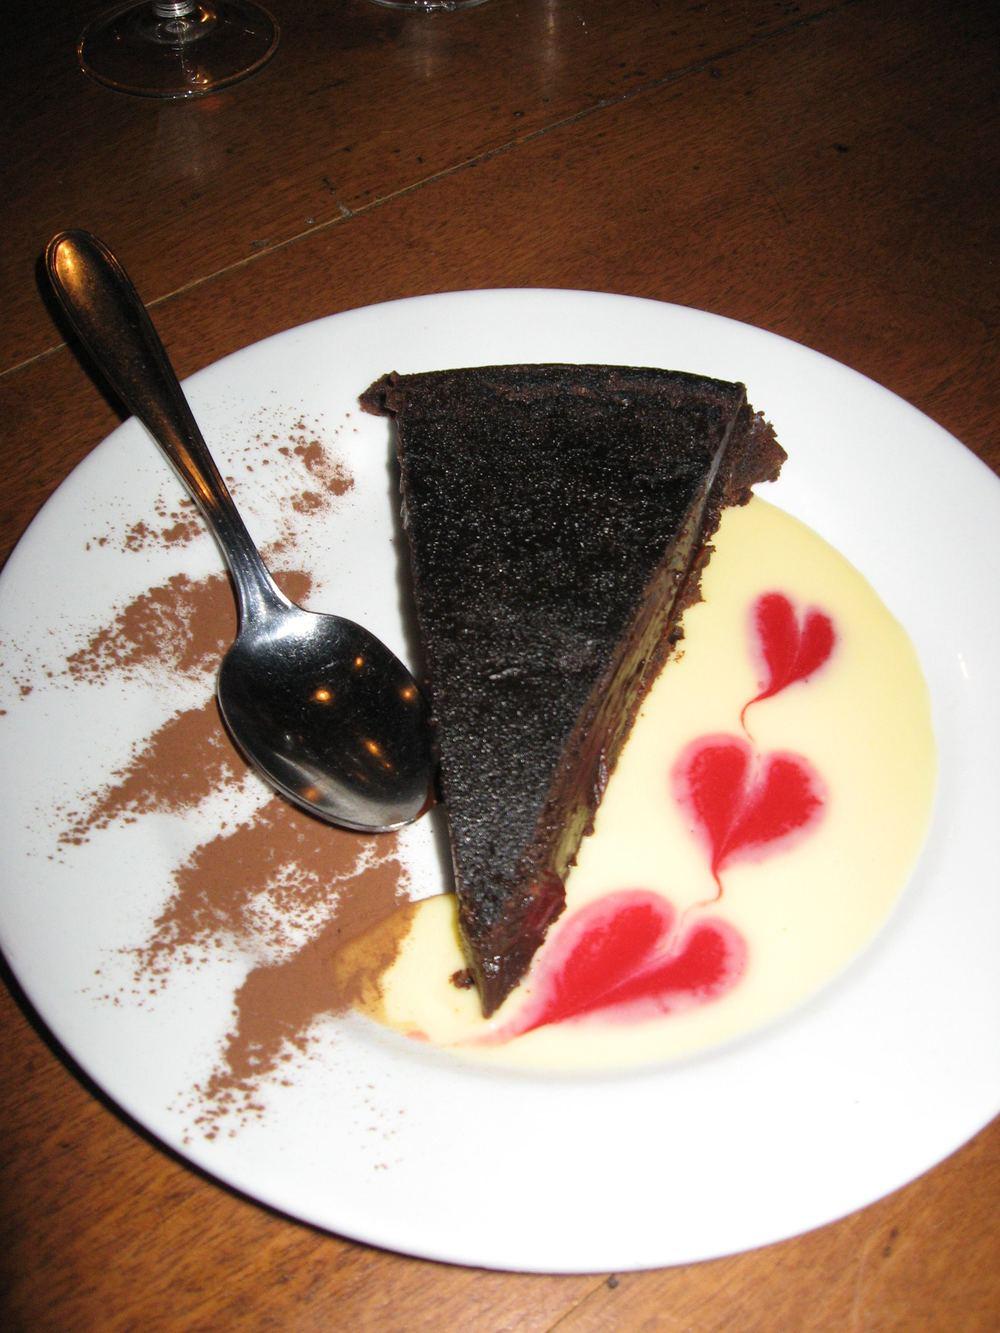 Decadent flourless chocolate cake in Lyon, France.